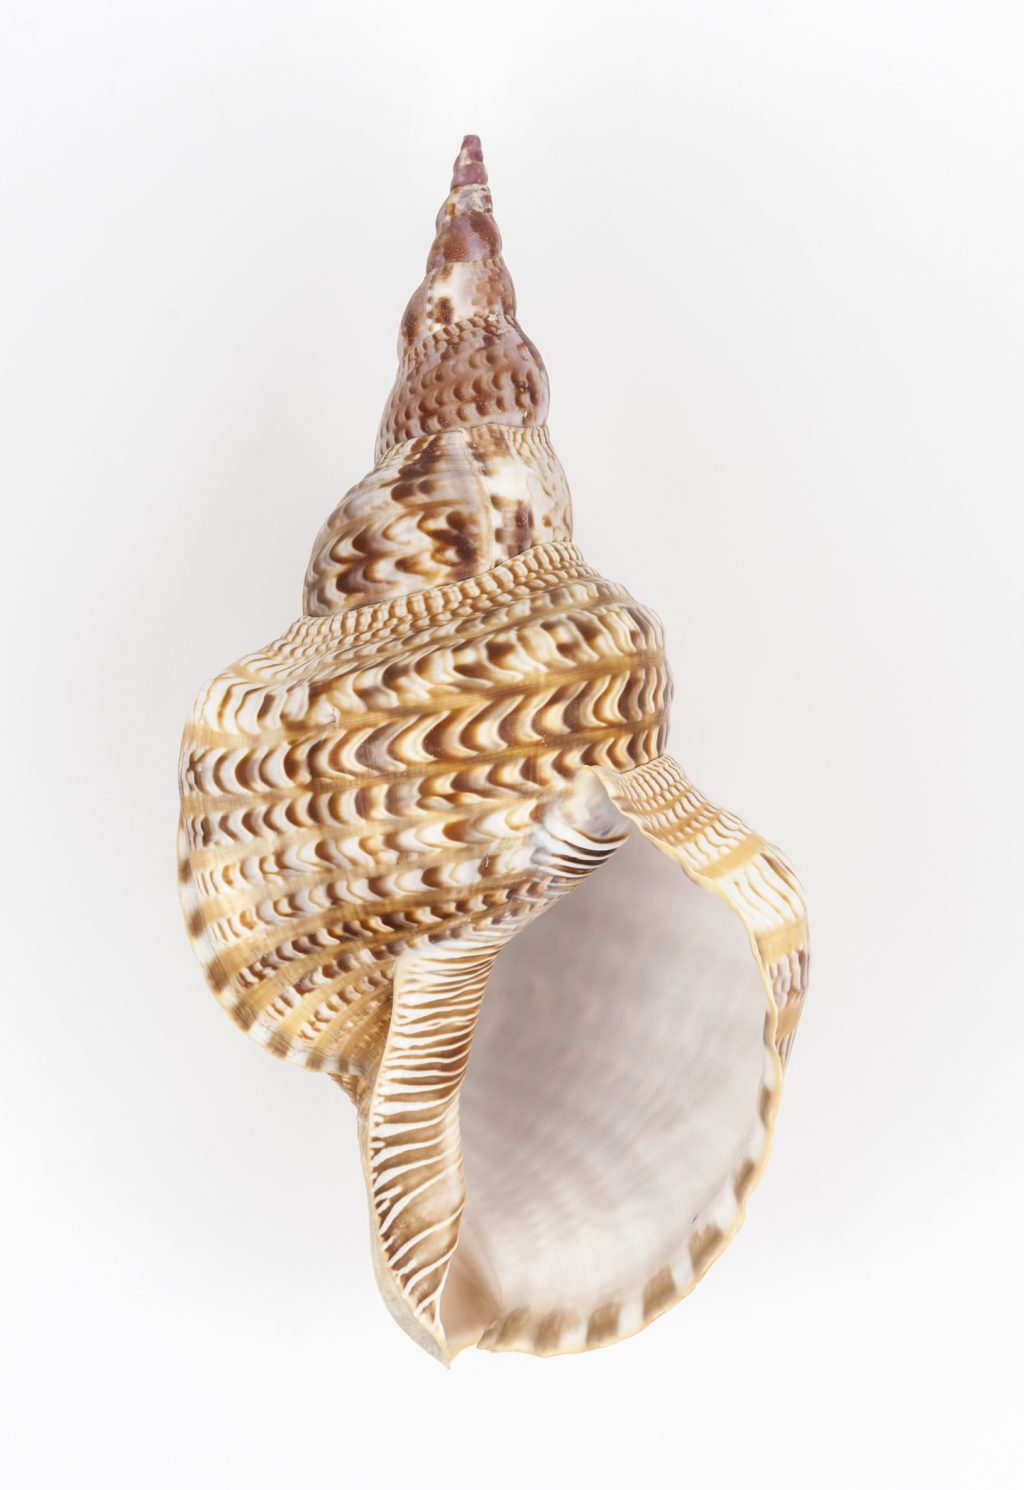 sea snail specimen